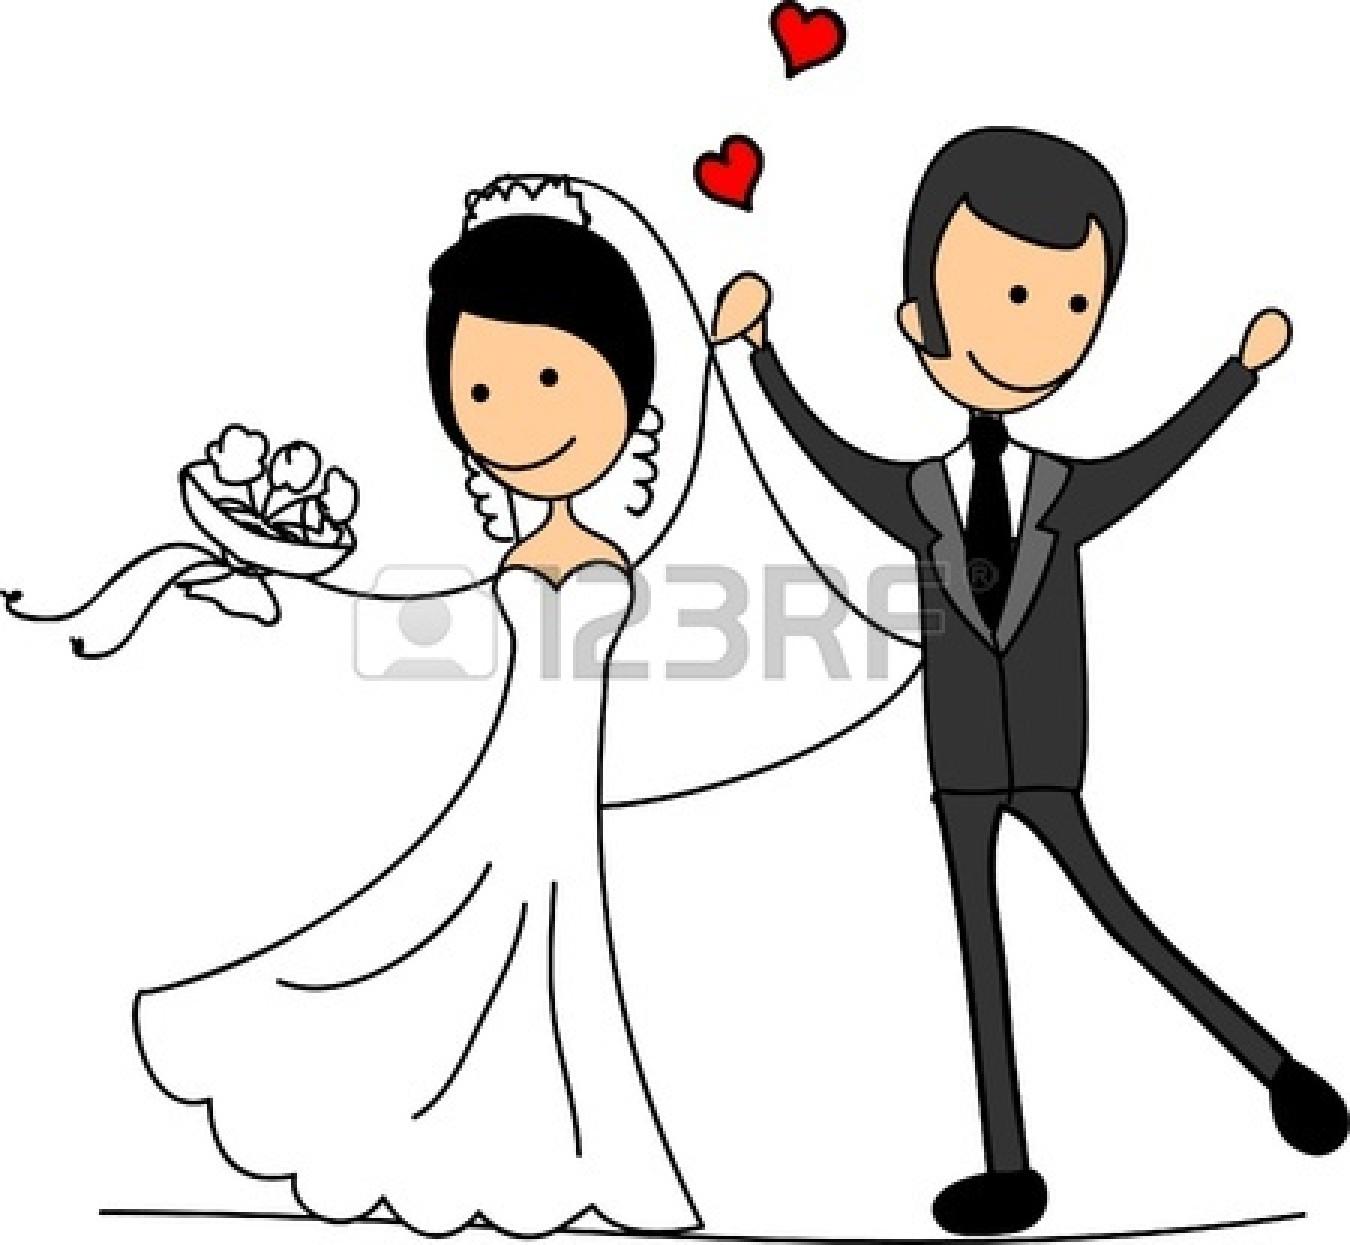 What Dream About Wedding Dress Means,Wedding White Satin Slip Dress